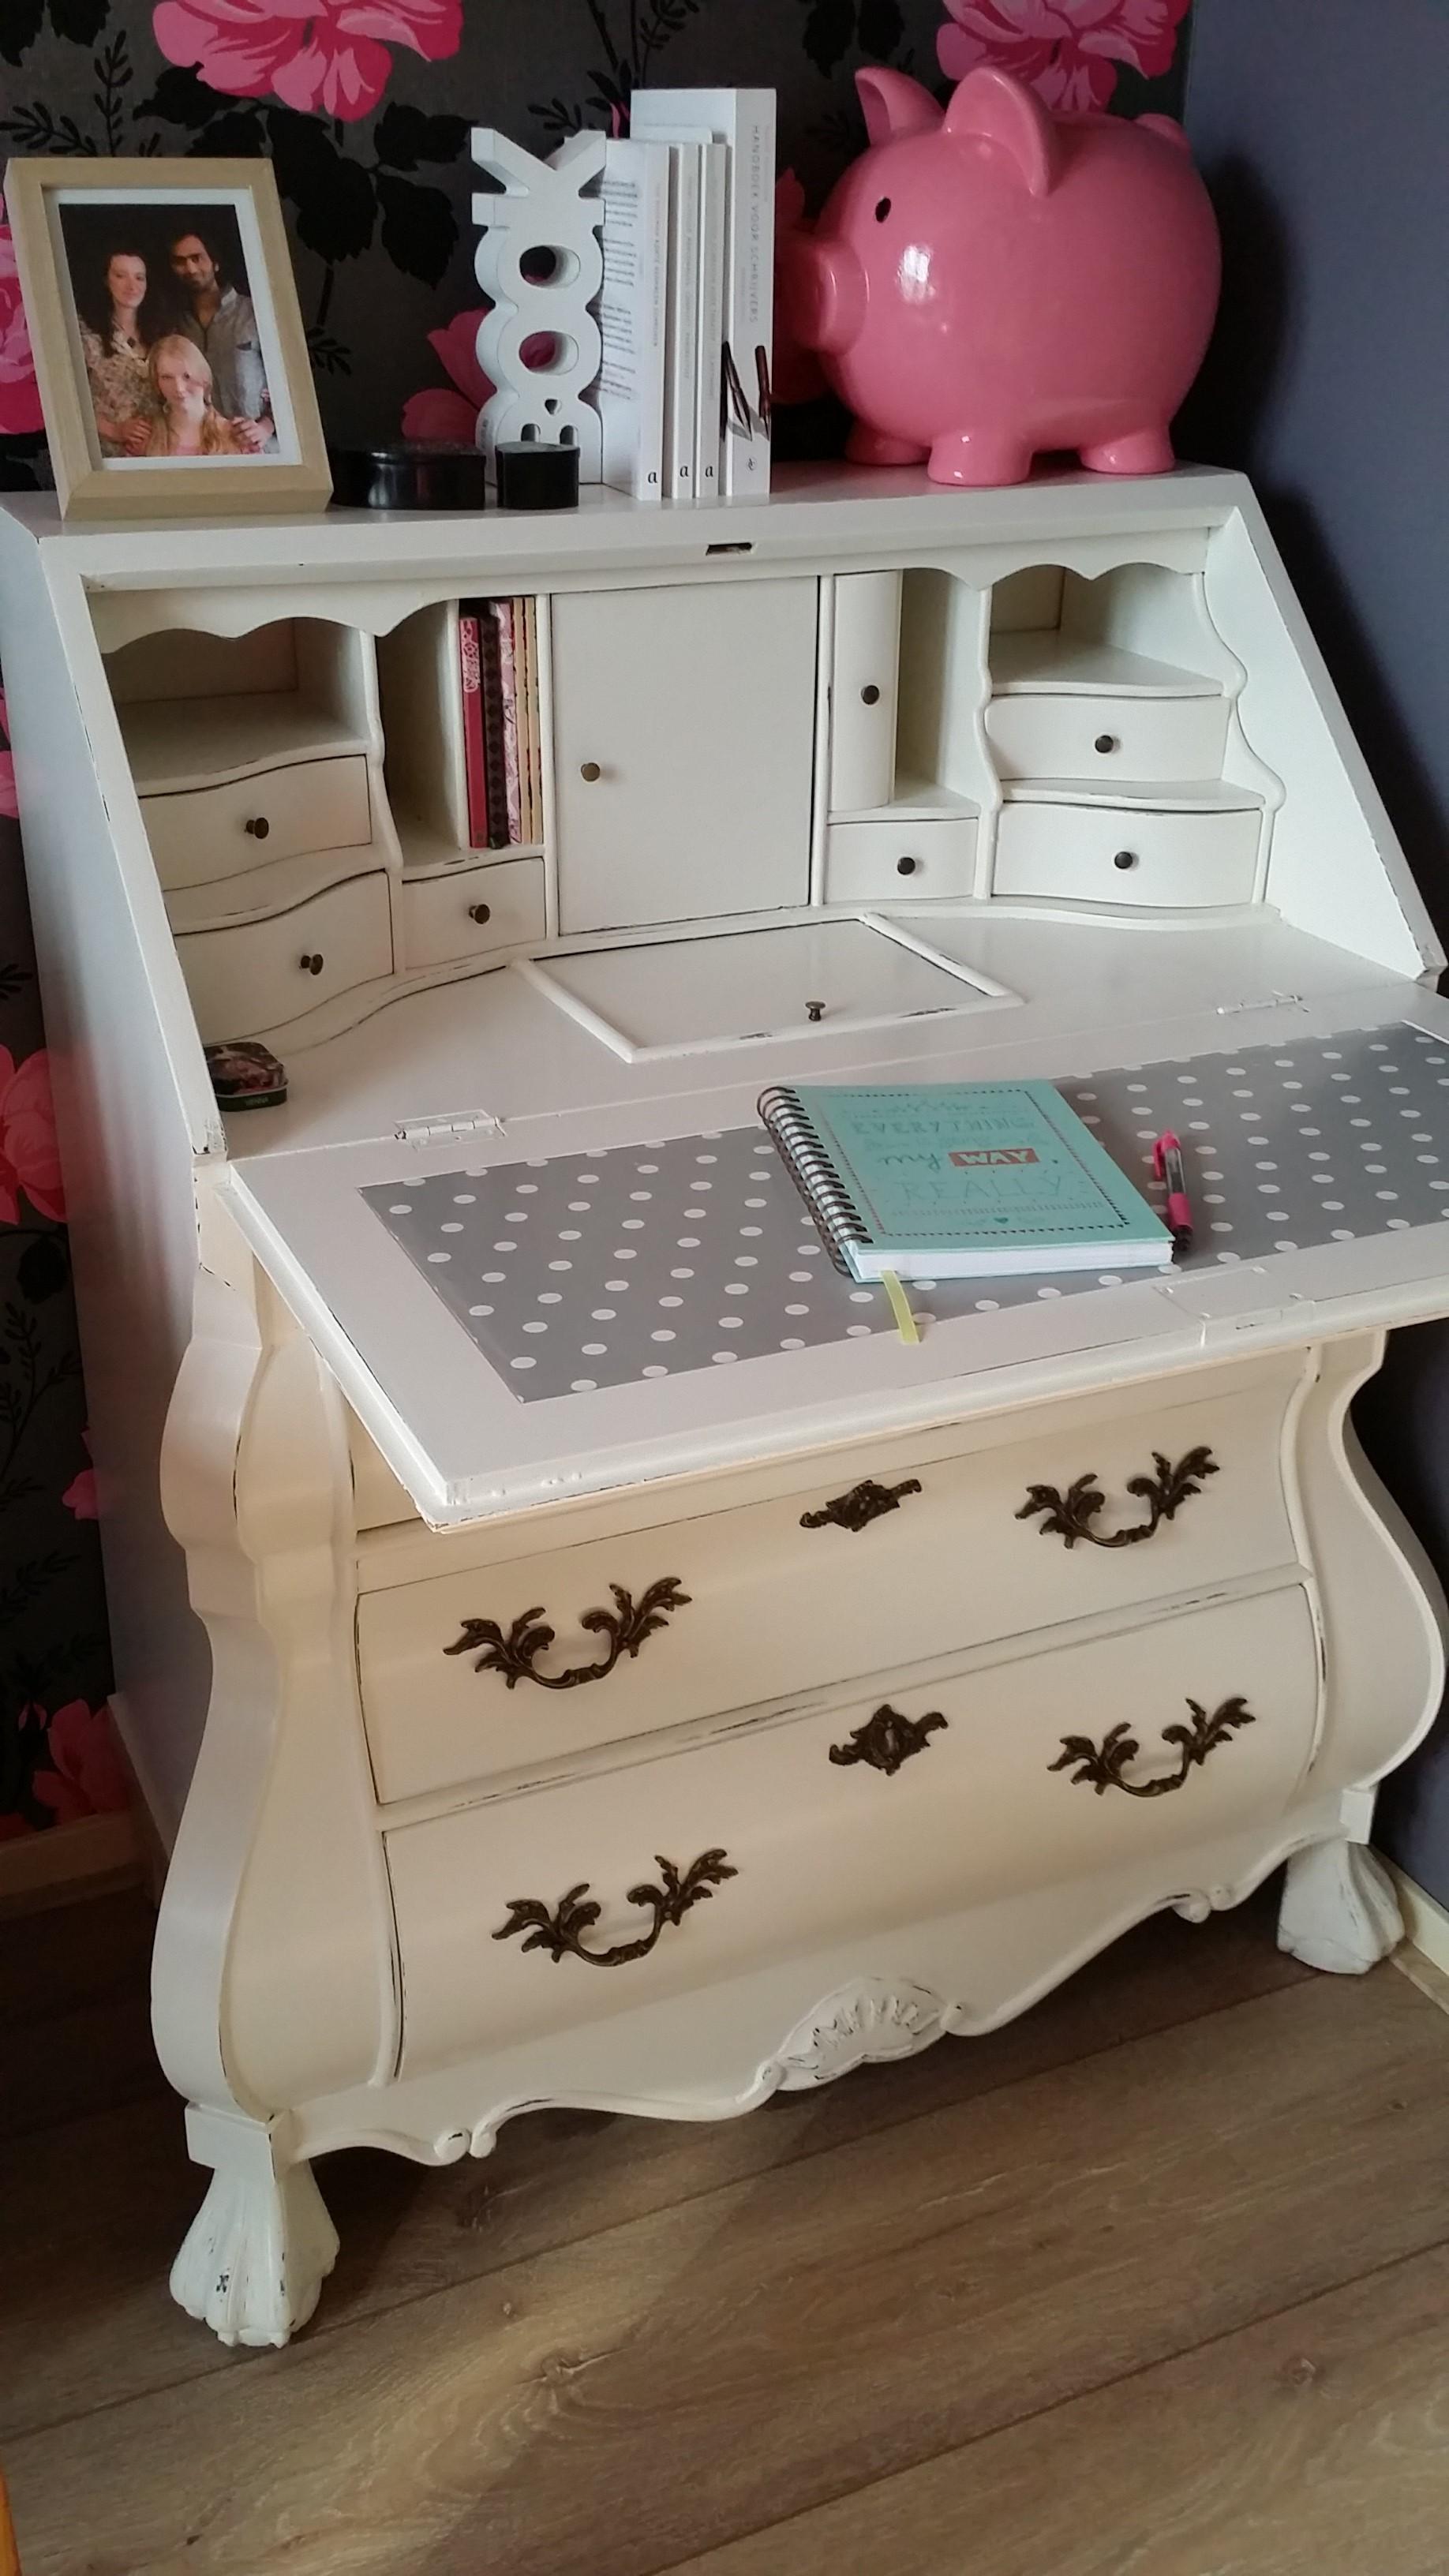 Tanya's 101 ~ Refurbishing - A Fairytale Desk | How to refurbish a secretary desk and make it your dream desk